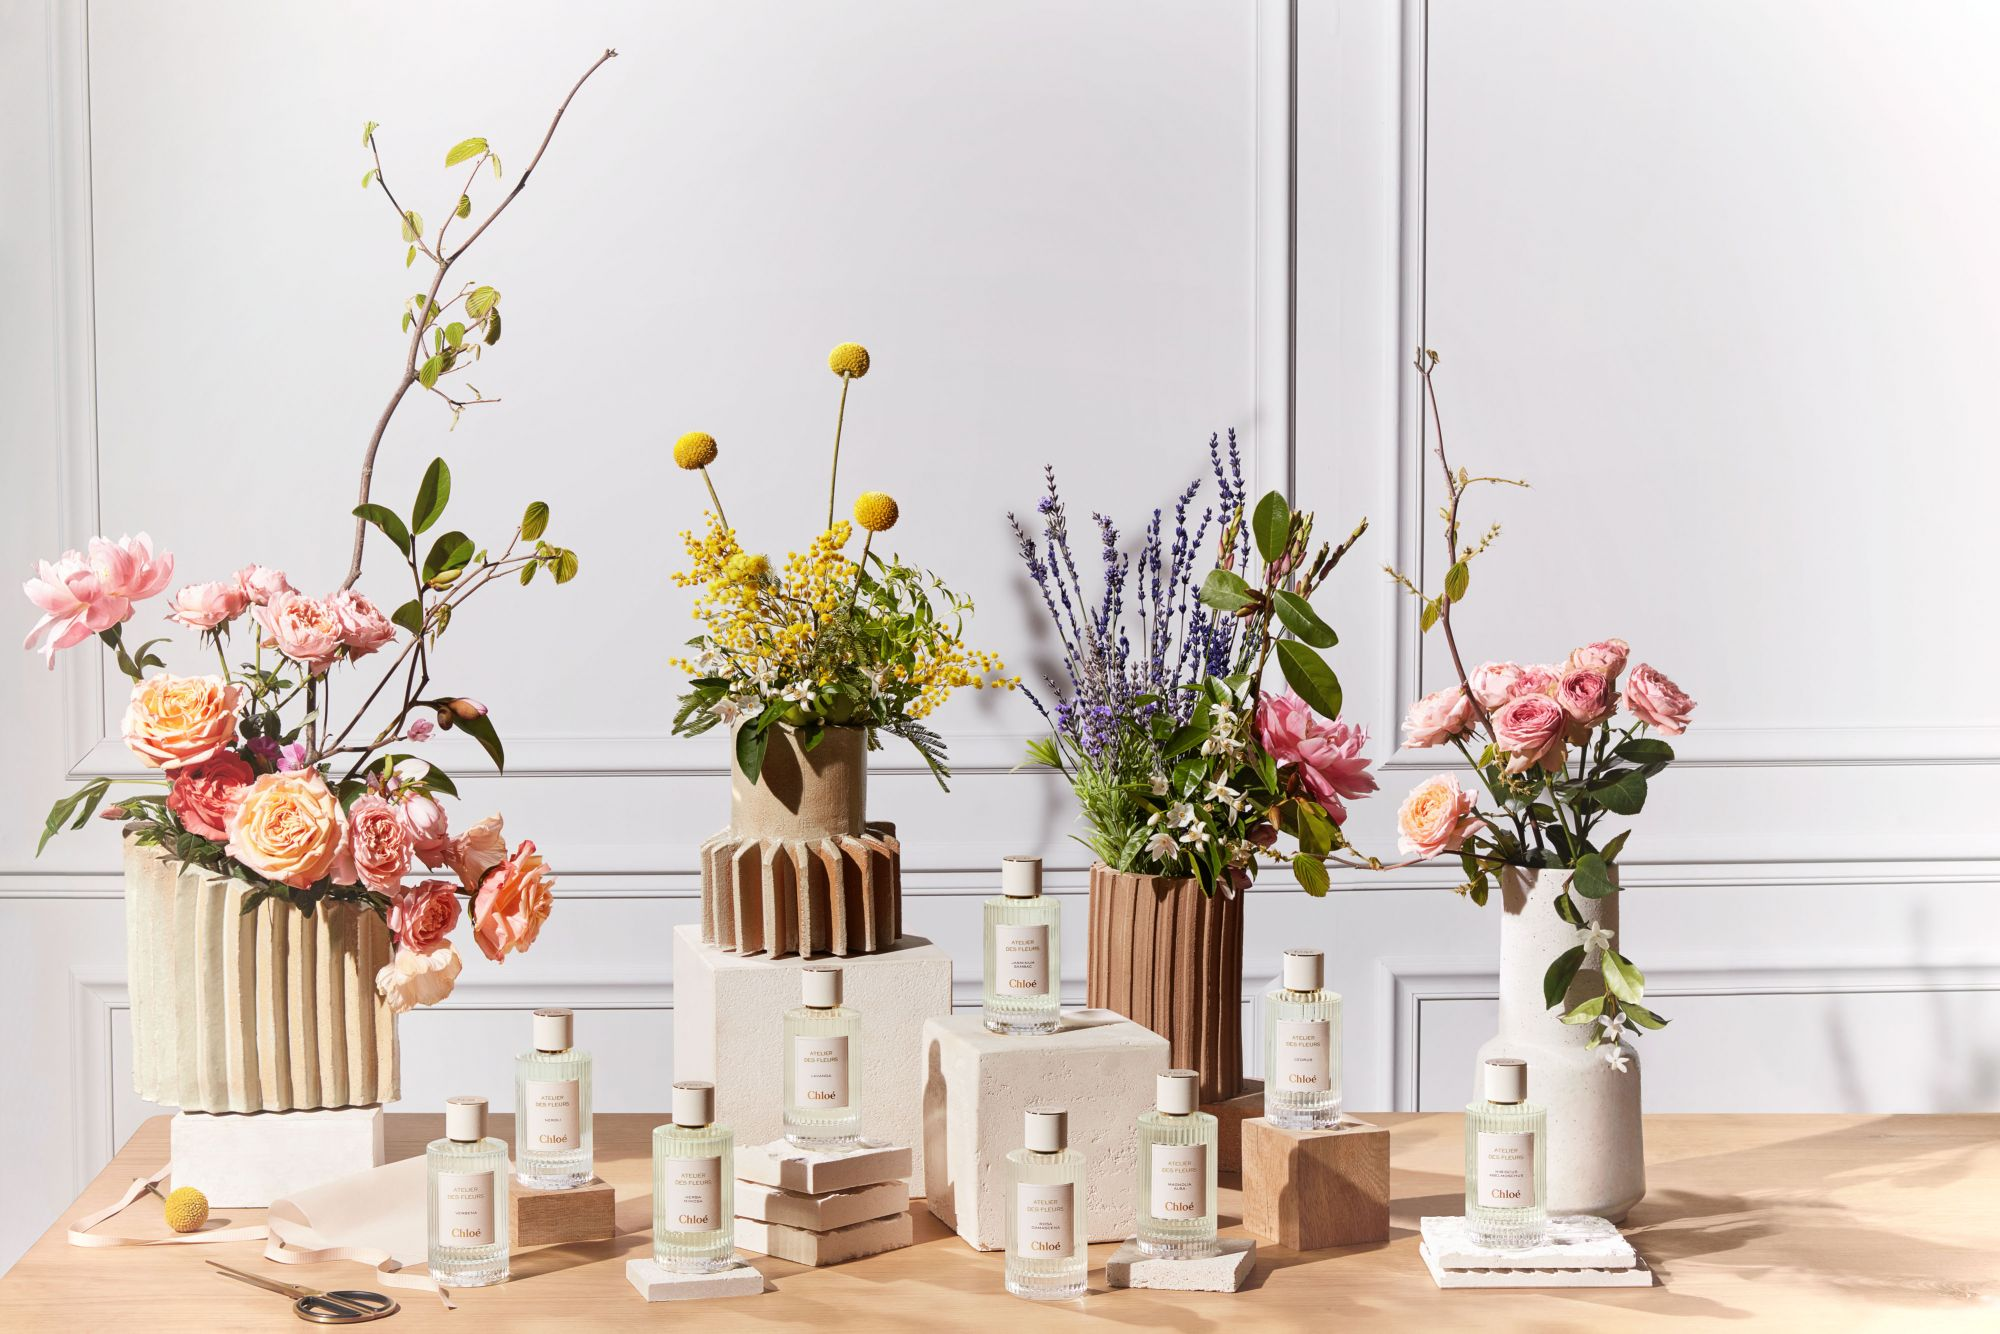 Chloé Atelier Des Fleurs Invites You To Compose Your Own Signature Perfume